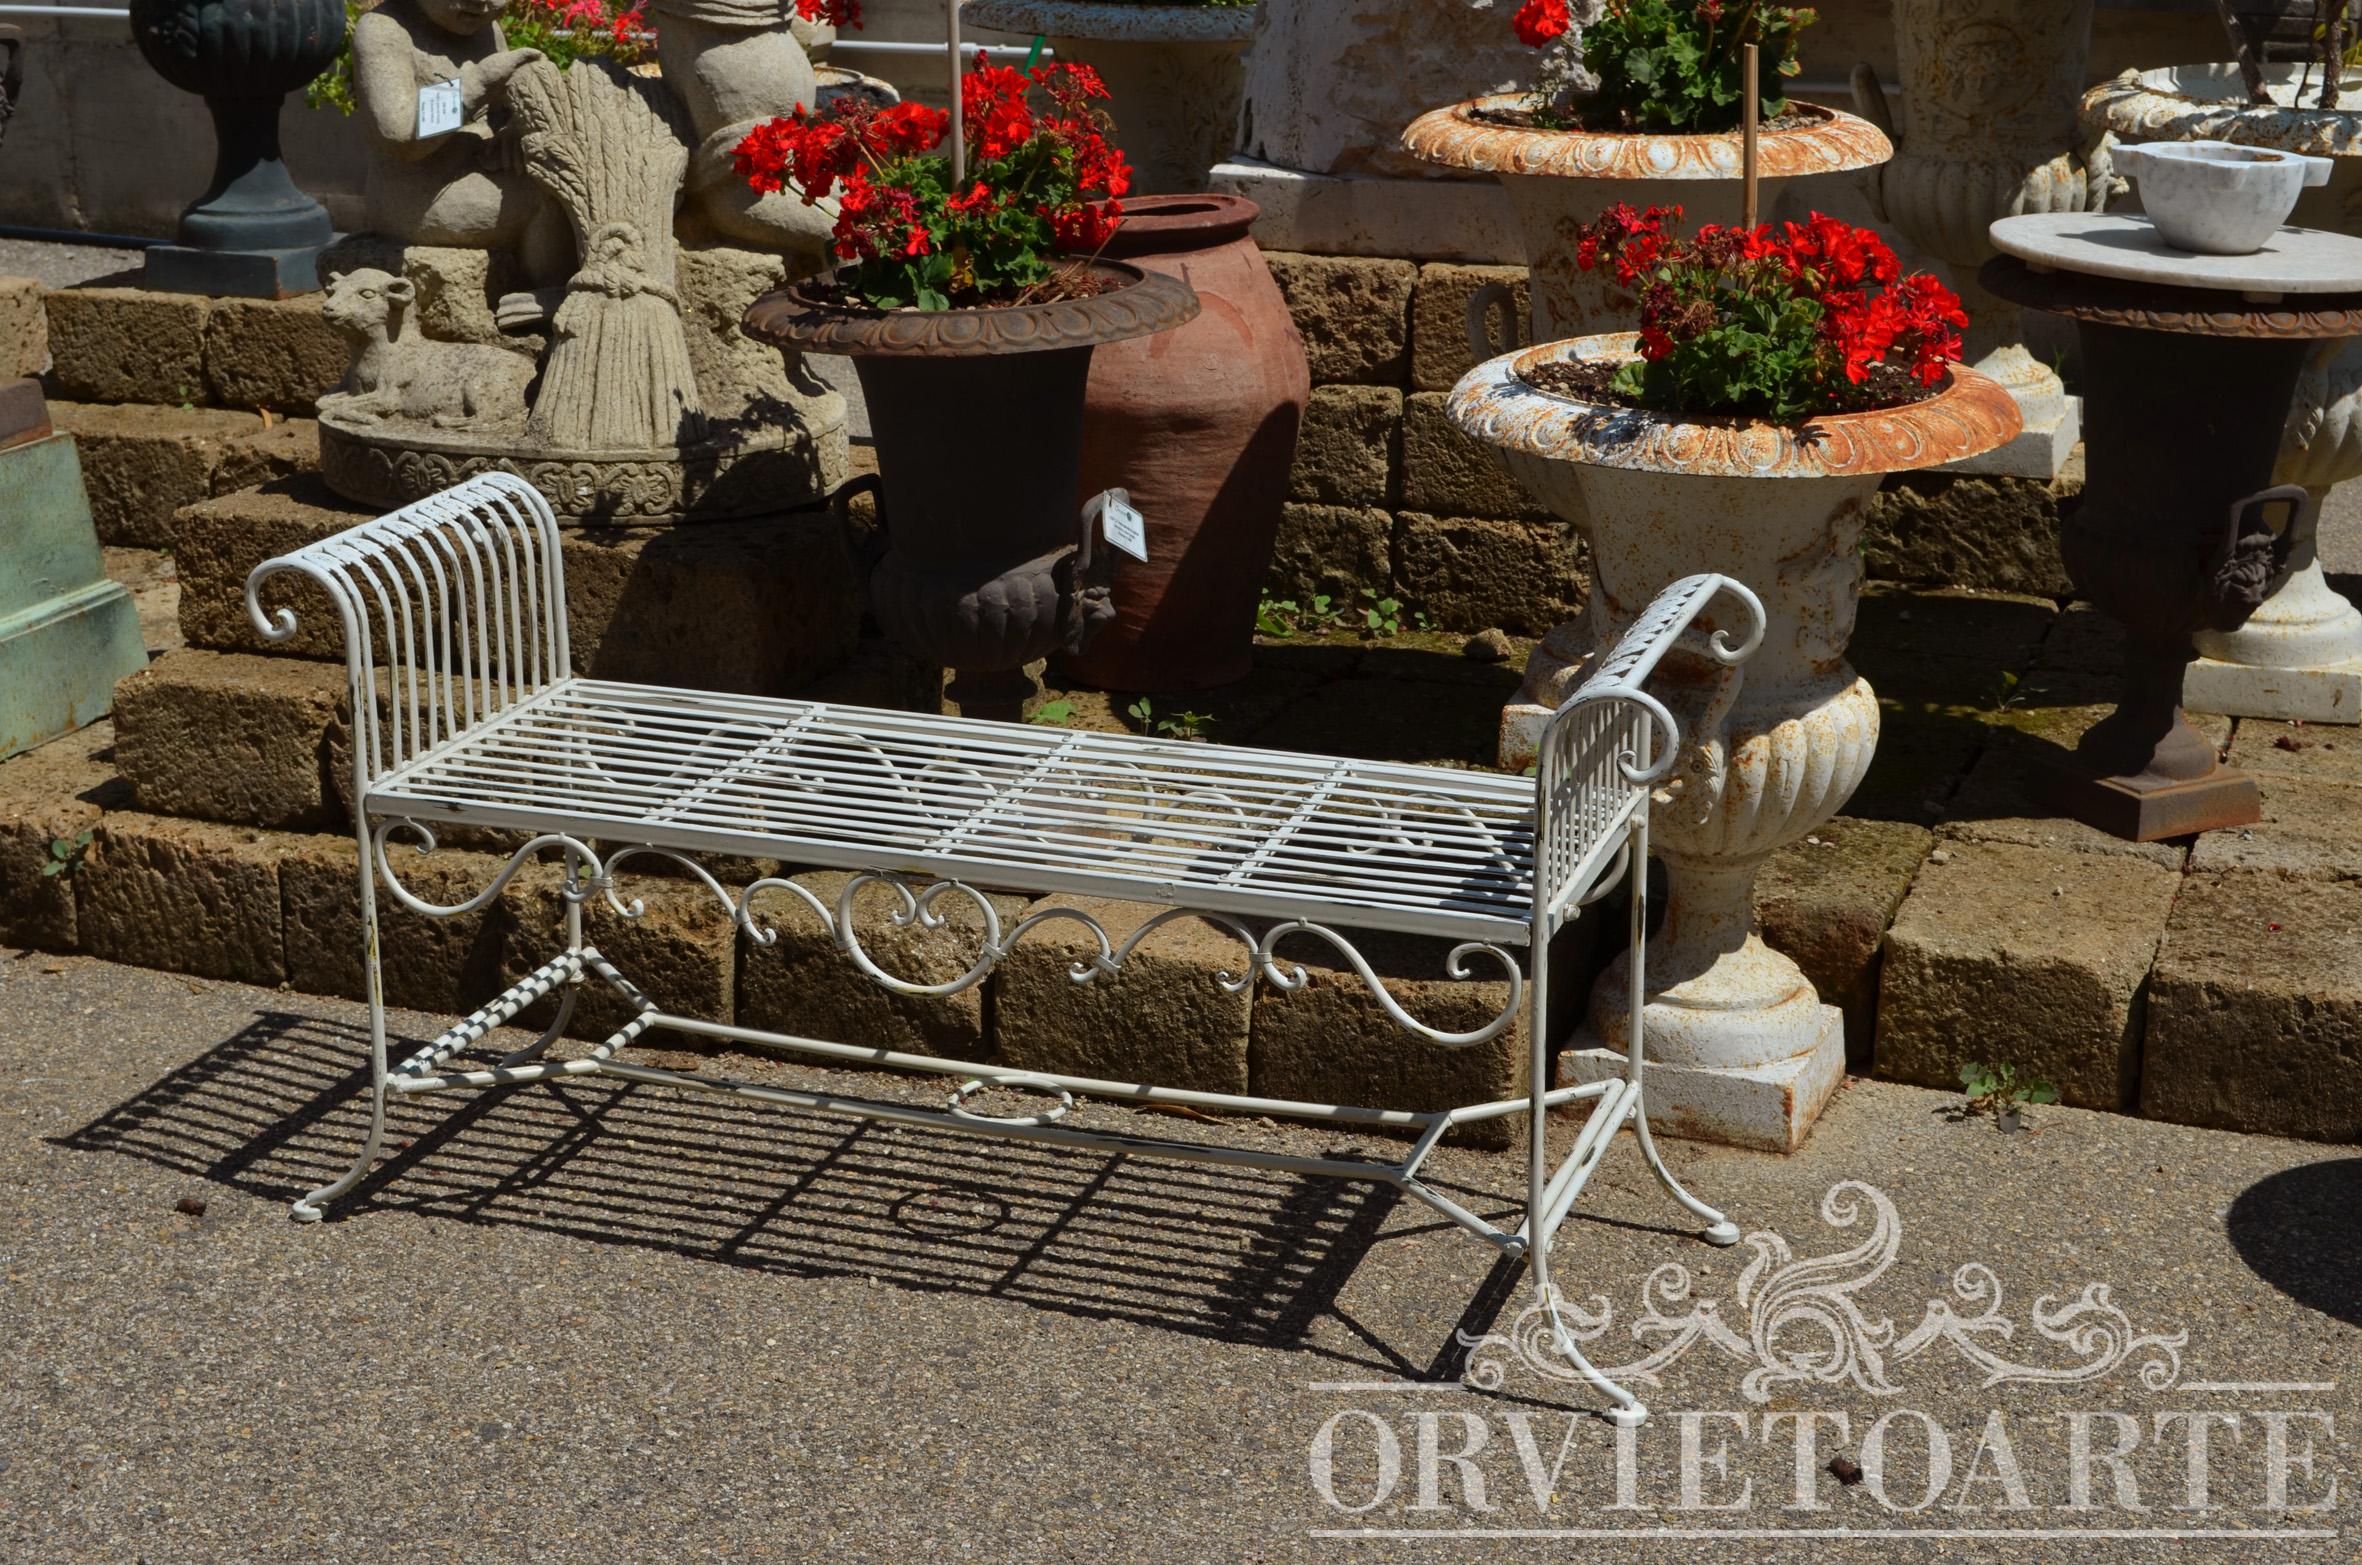 Orvieto arte dormeuse in ferro for Arredo giardino perugia